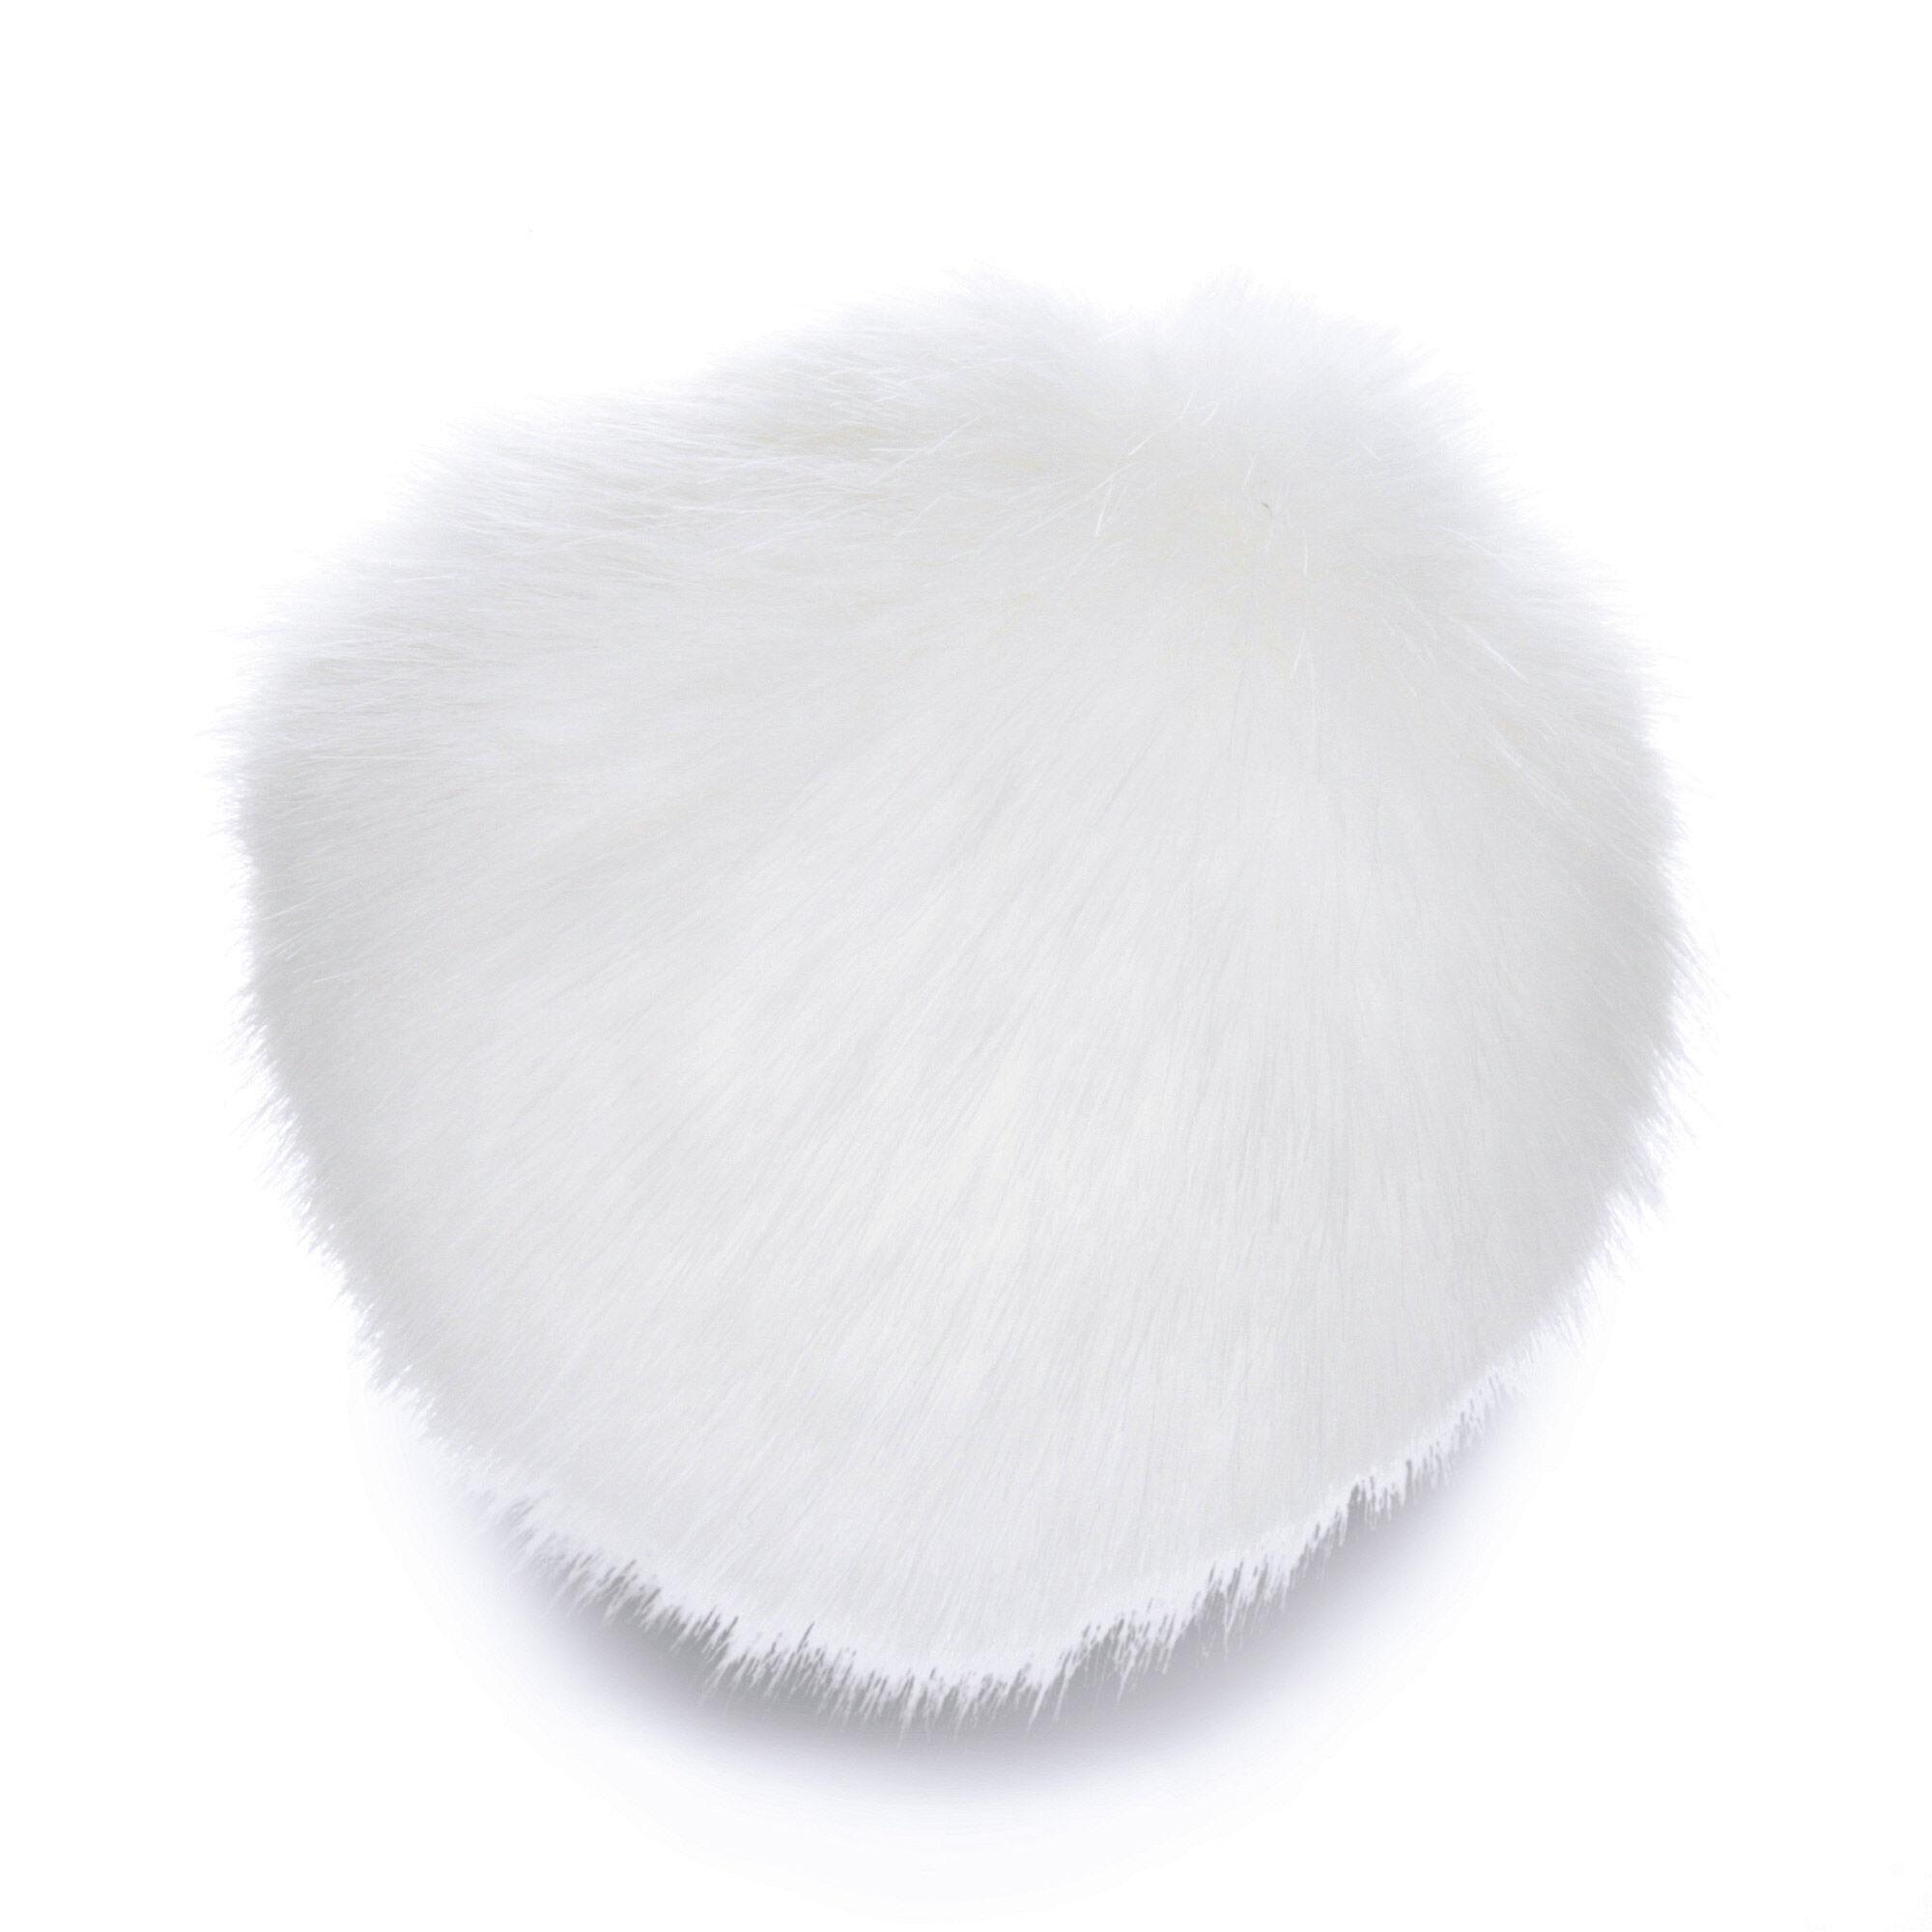 Pompom Keychain Shoe Clips DIY 5 Pieces Smoke Grey Faux Rabbit Fur Pom Poms,6 8 10m Lovely Faux Fur Pompoms For Crochet Knitting Hat